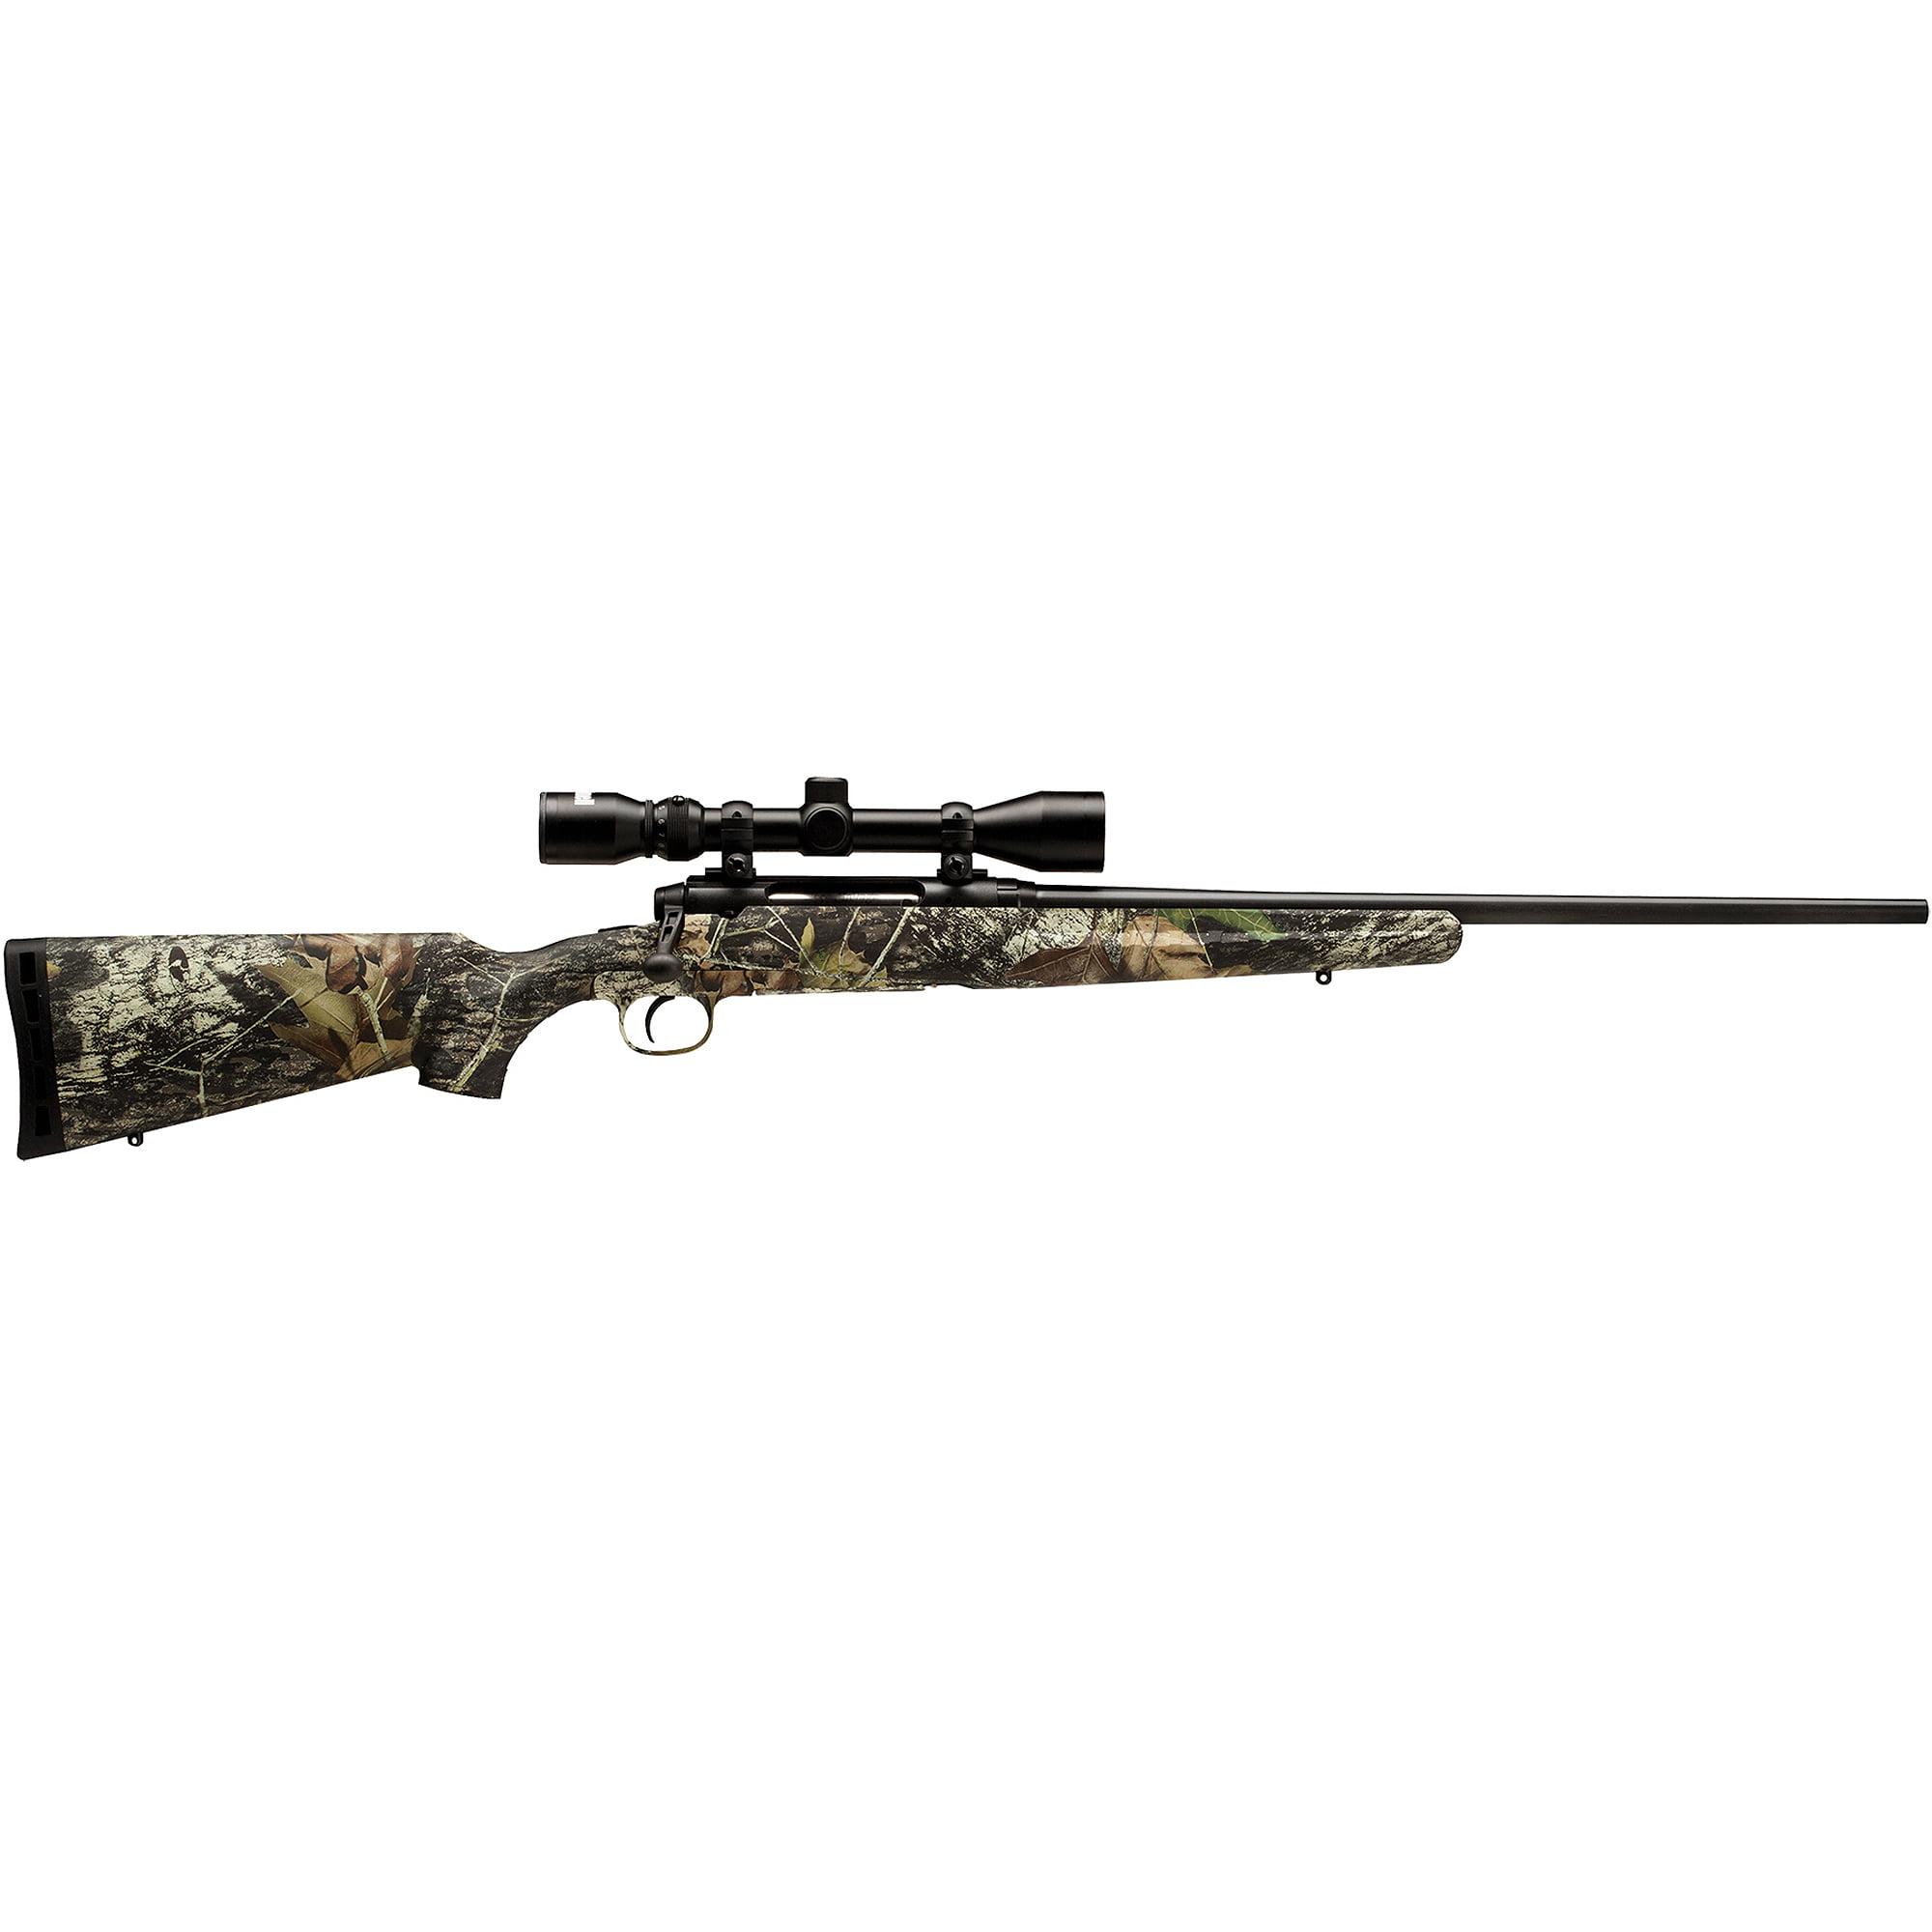 Savage Bolt Rifle Axis Xp 22250 Camo W/s